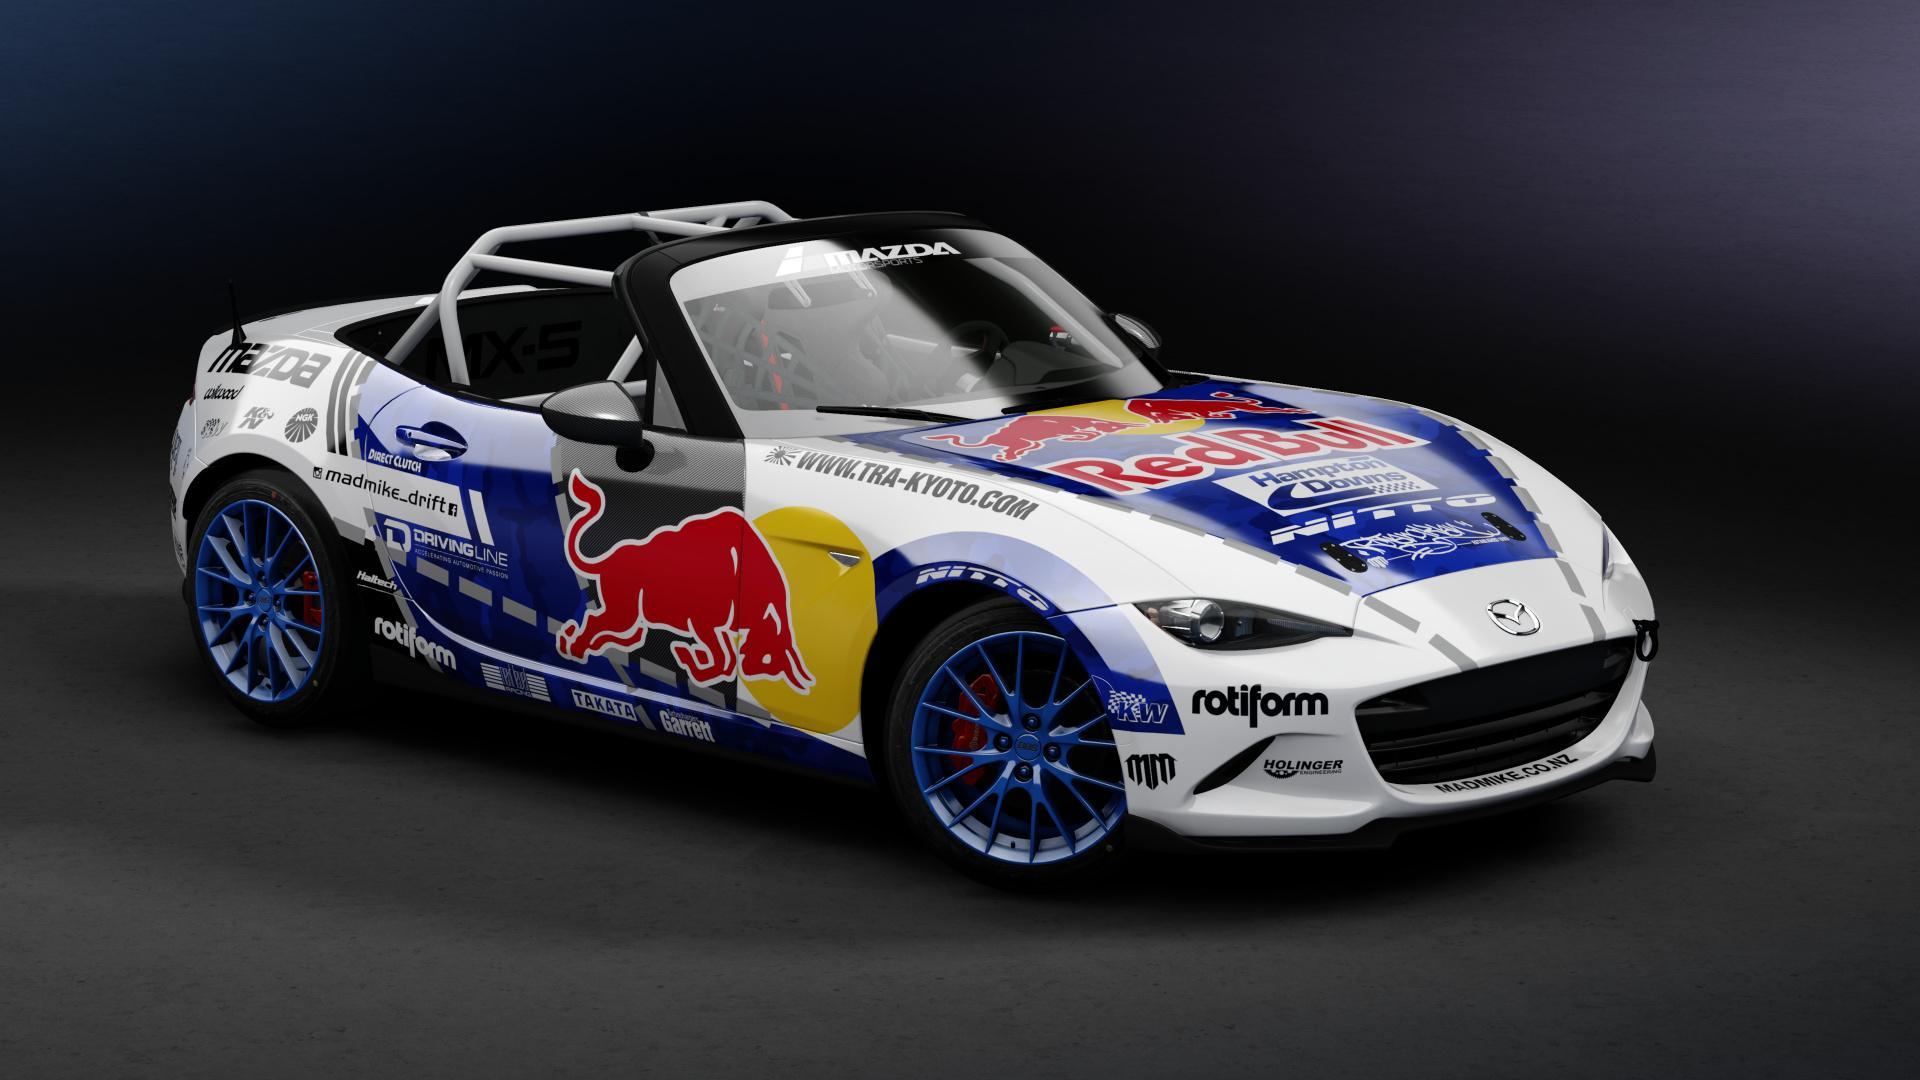 Preview of Mazda MX5 Red Bull  by Krisztián Kónya